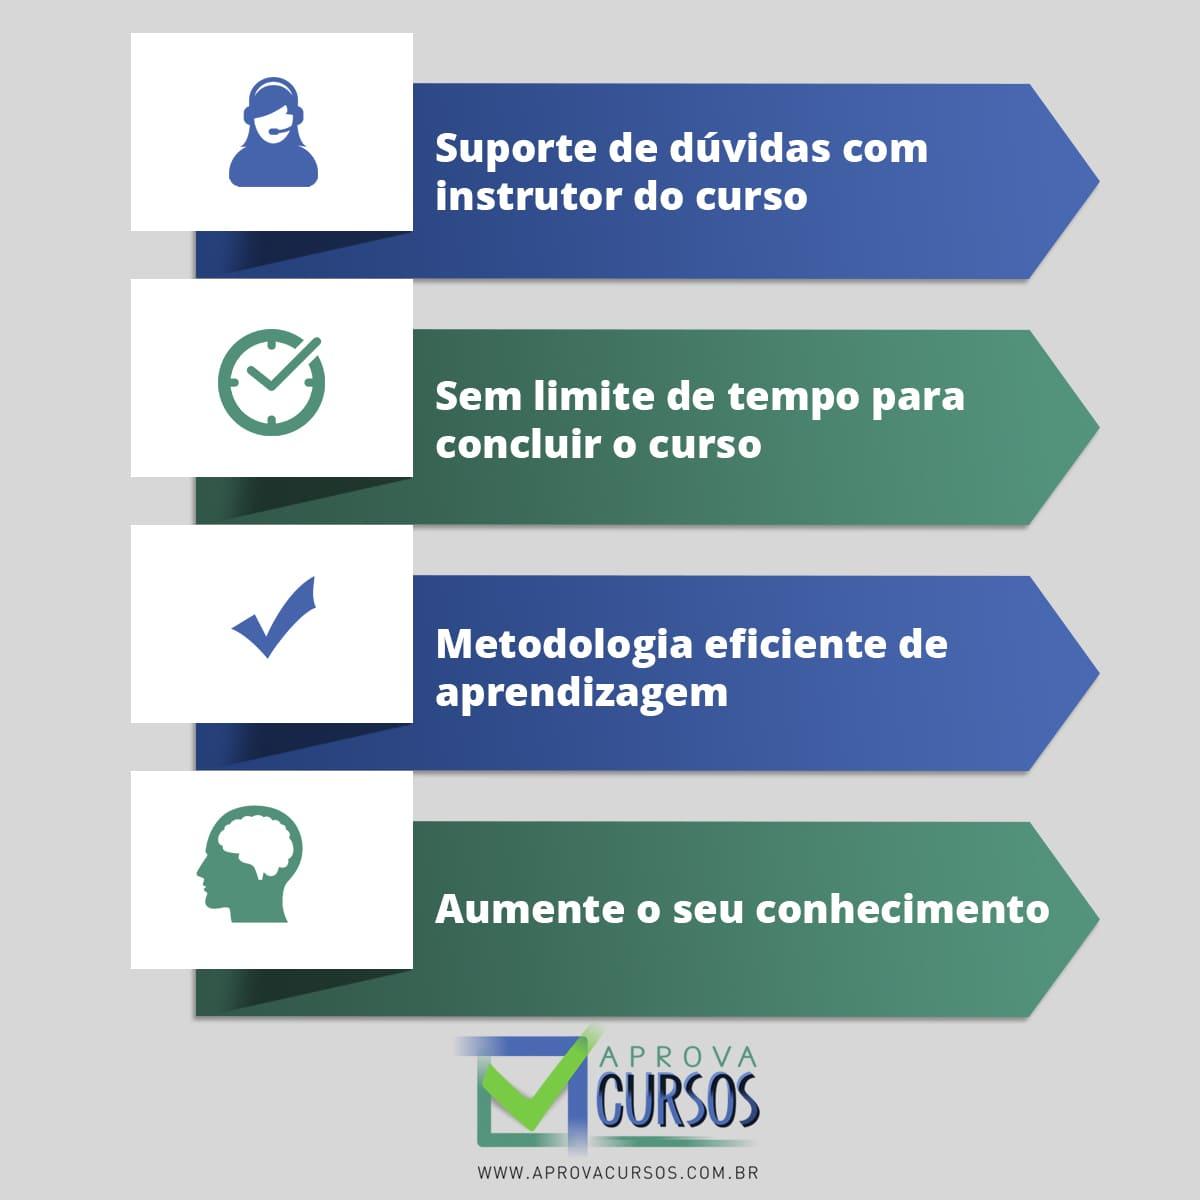 Curso Online de BrOffice com Certificado  - Aprova Cursos